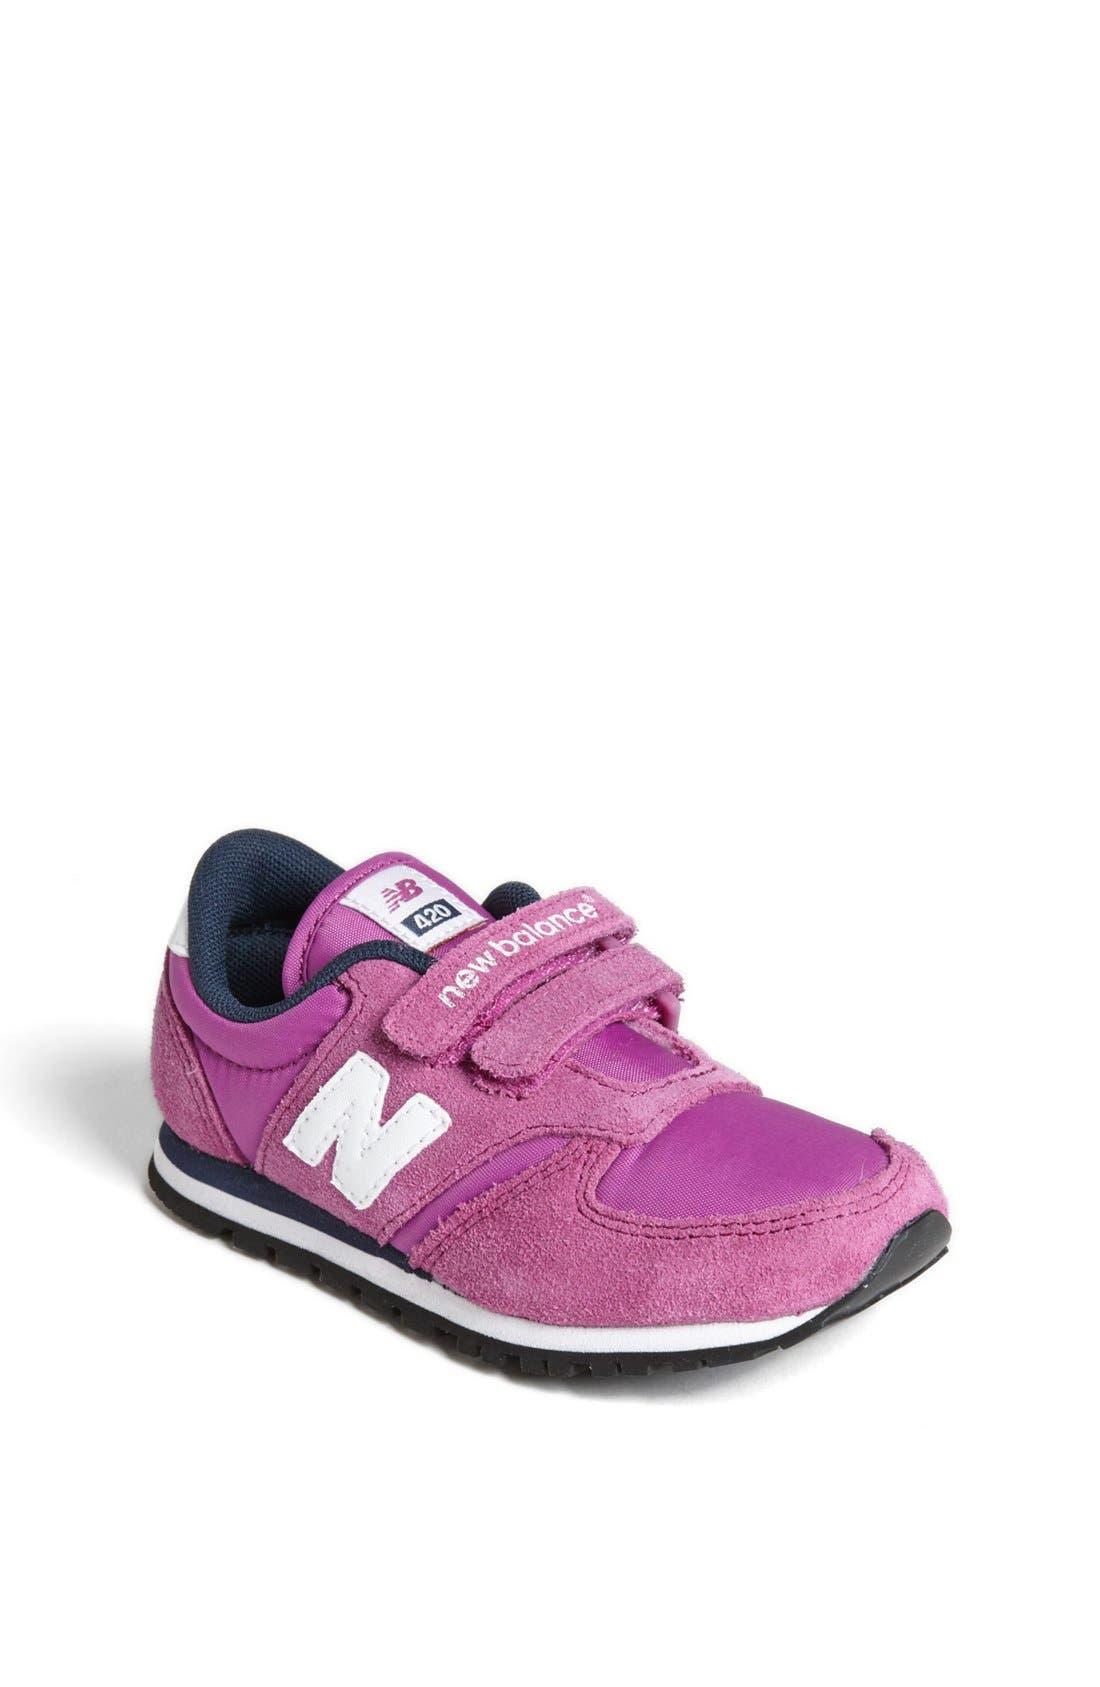 Alternate Image 1 Selected - New Balance '420 Take Down' Sneaker (Walker & Toddler)